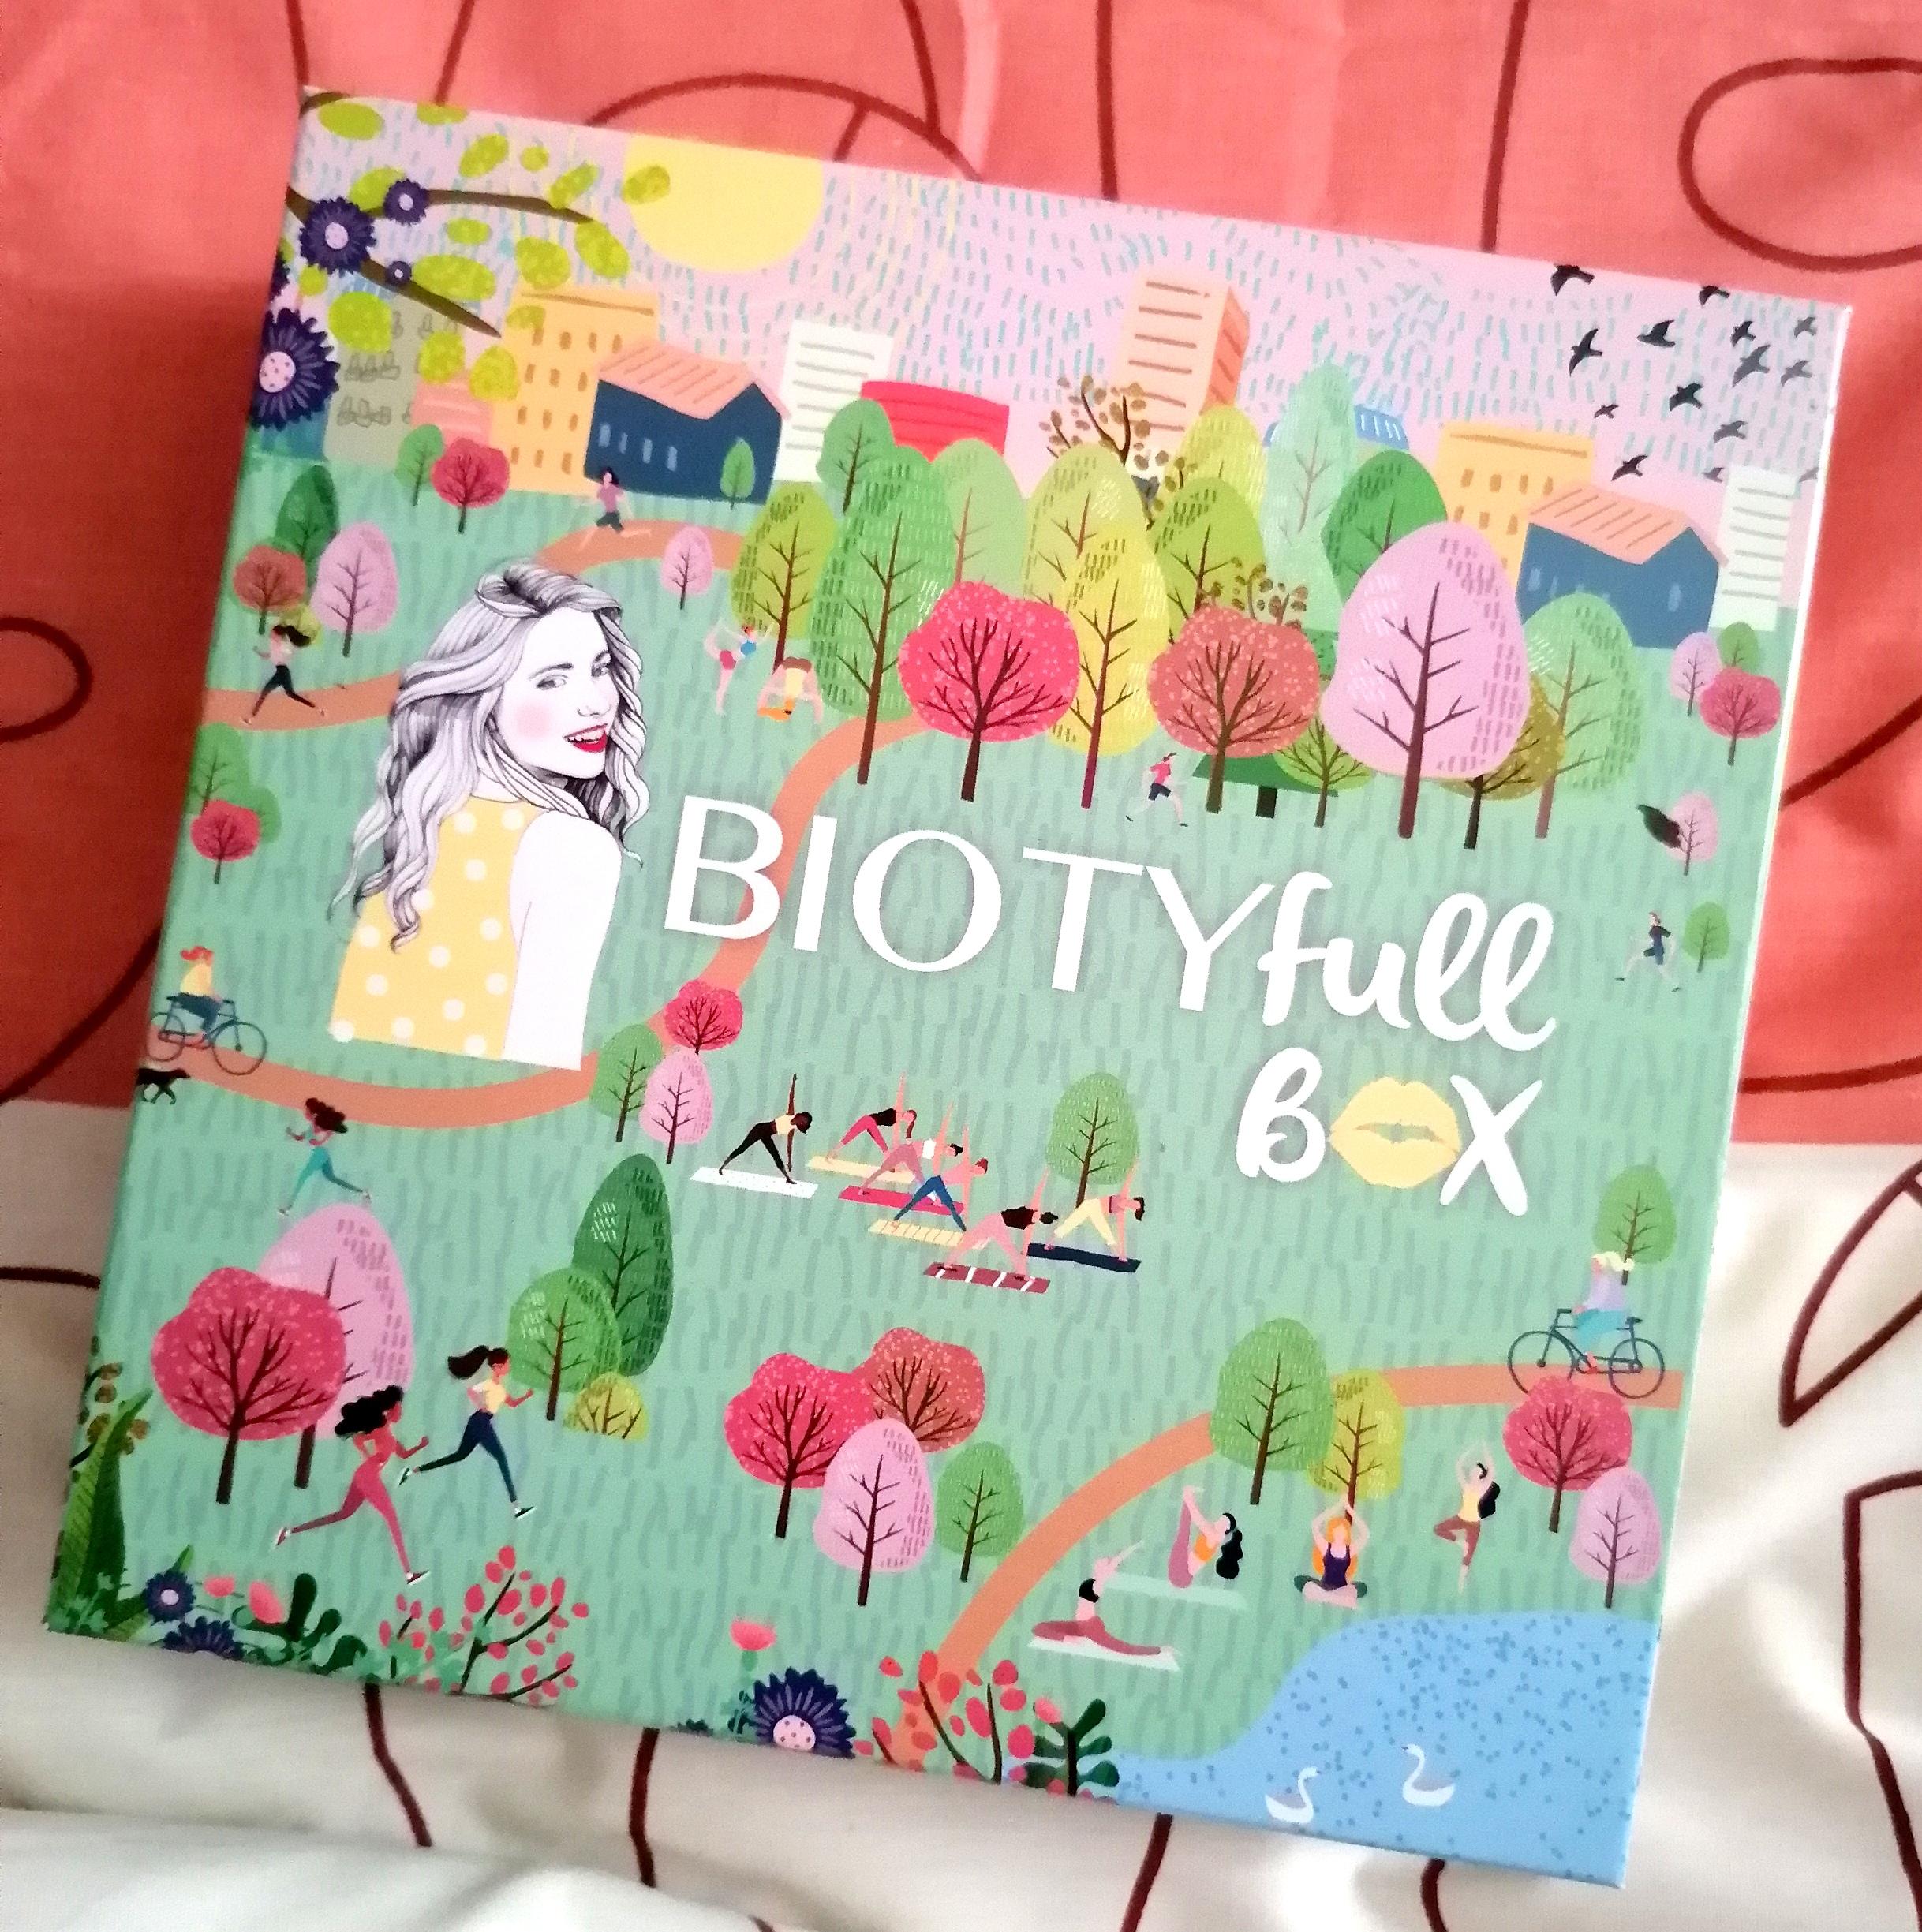 Biotyfull Box Mars (2021) : La sportive réconfortante! 💪🏽💆🏽♀️